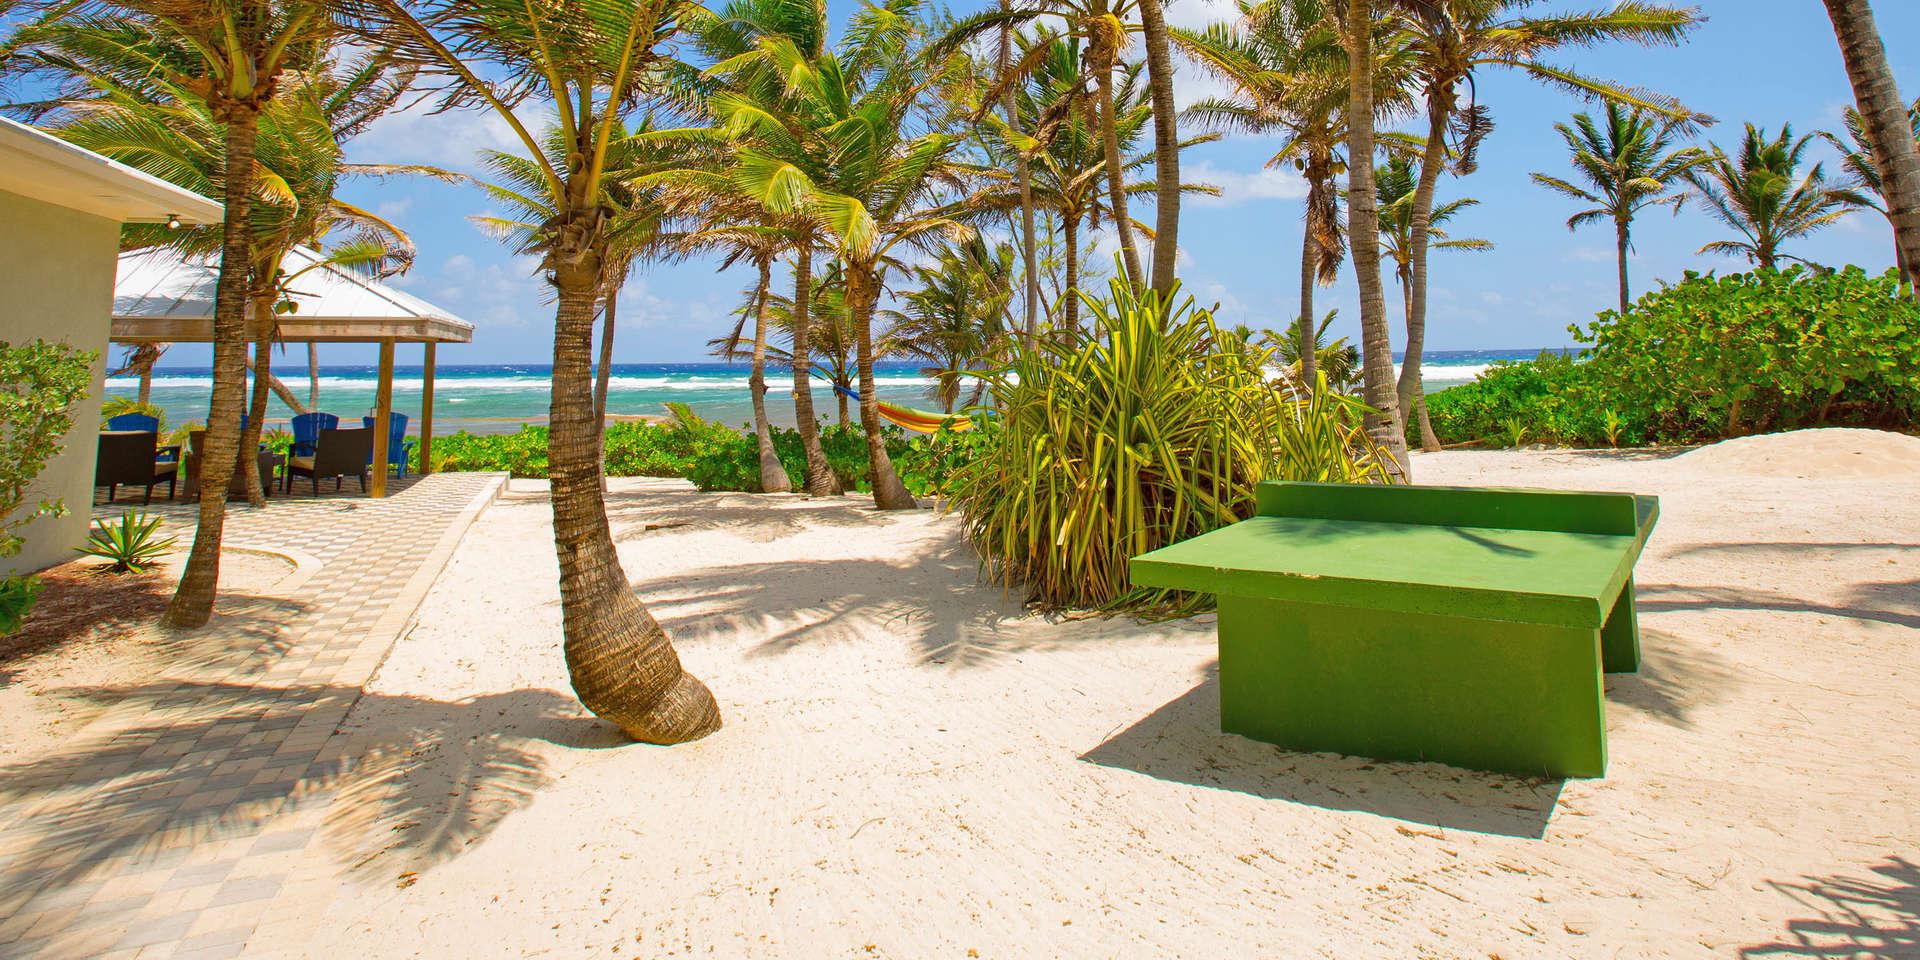 Luxury Villa Als Caribbean Cayman Islands Grand Rum Point Coconut Beach